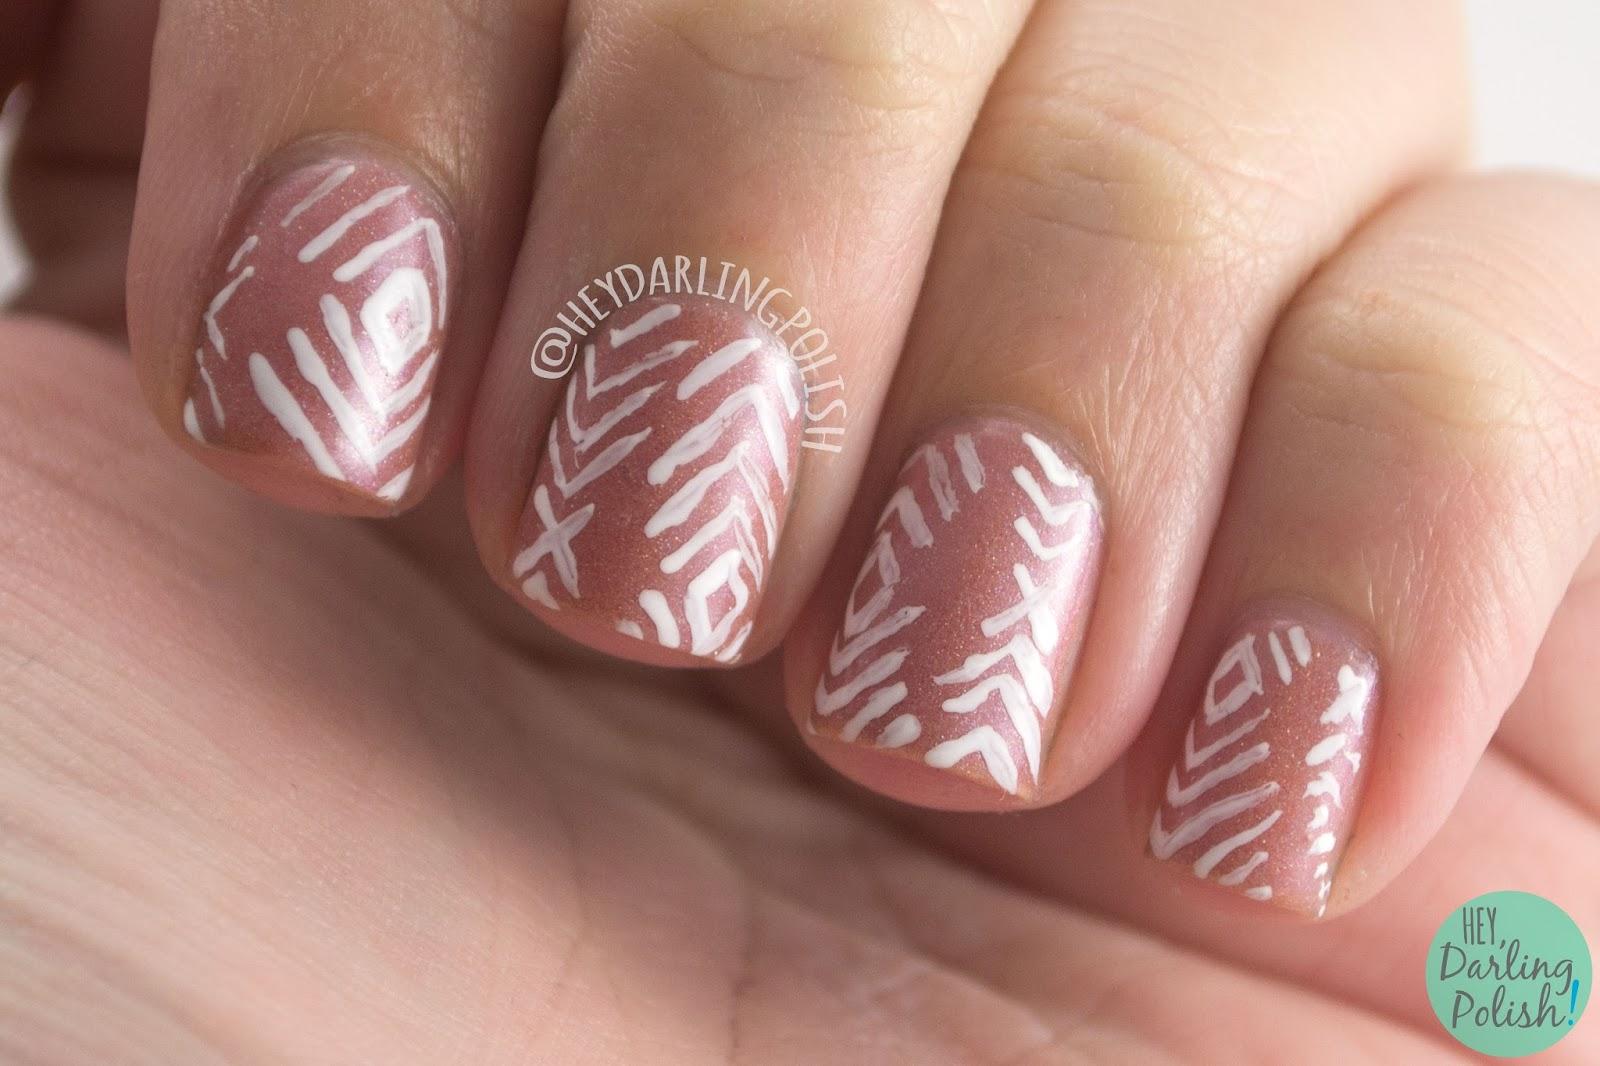 fairest of them all, nude, sparkle, pattern, nails, nail art, nail polish, indie polish, fair maiden polish, hey darling polish,